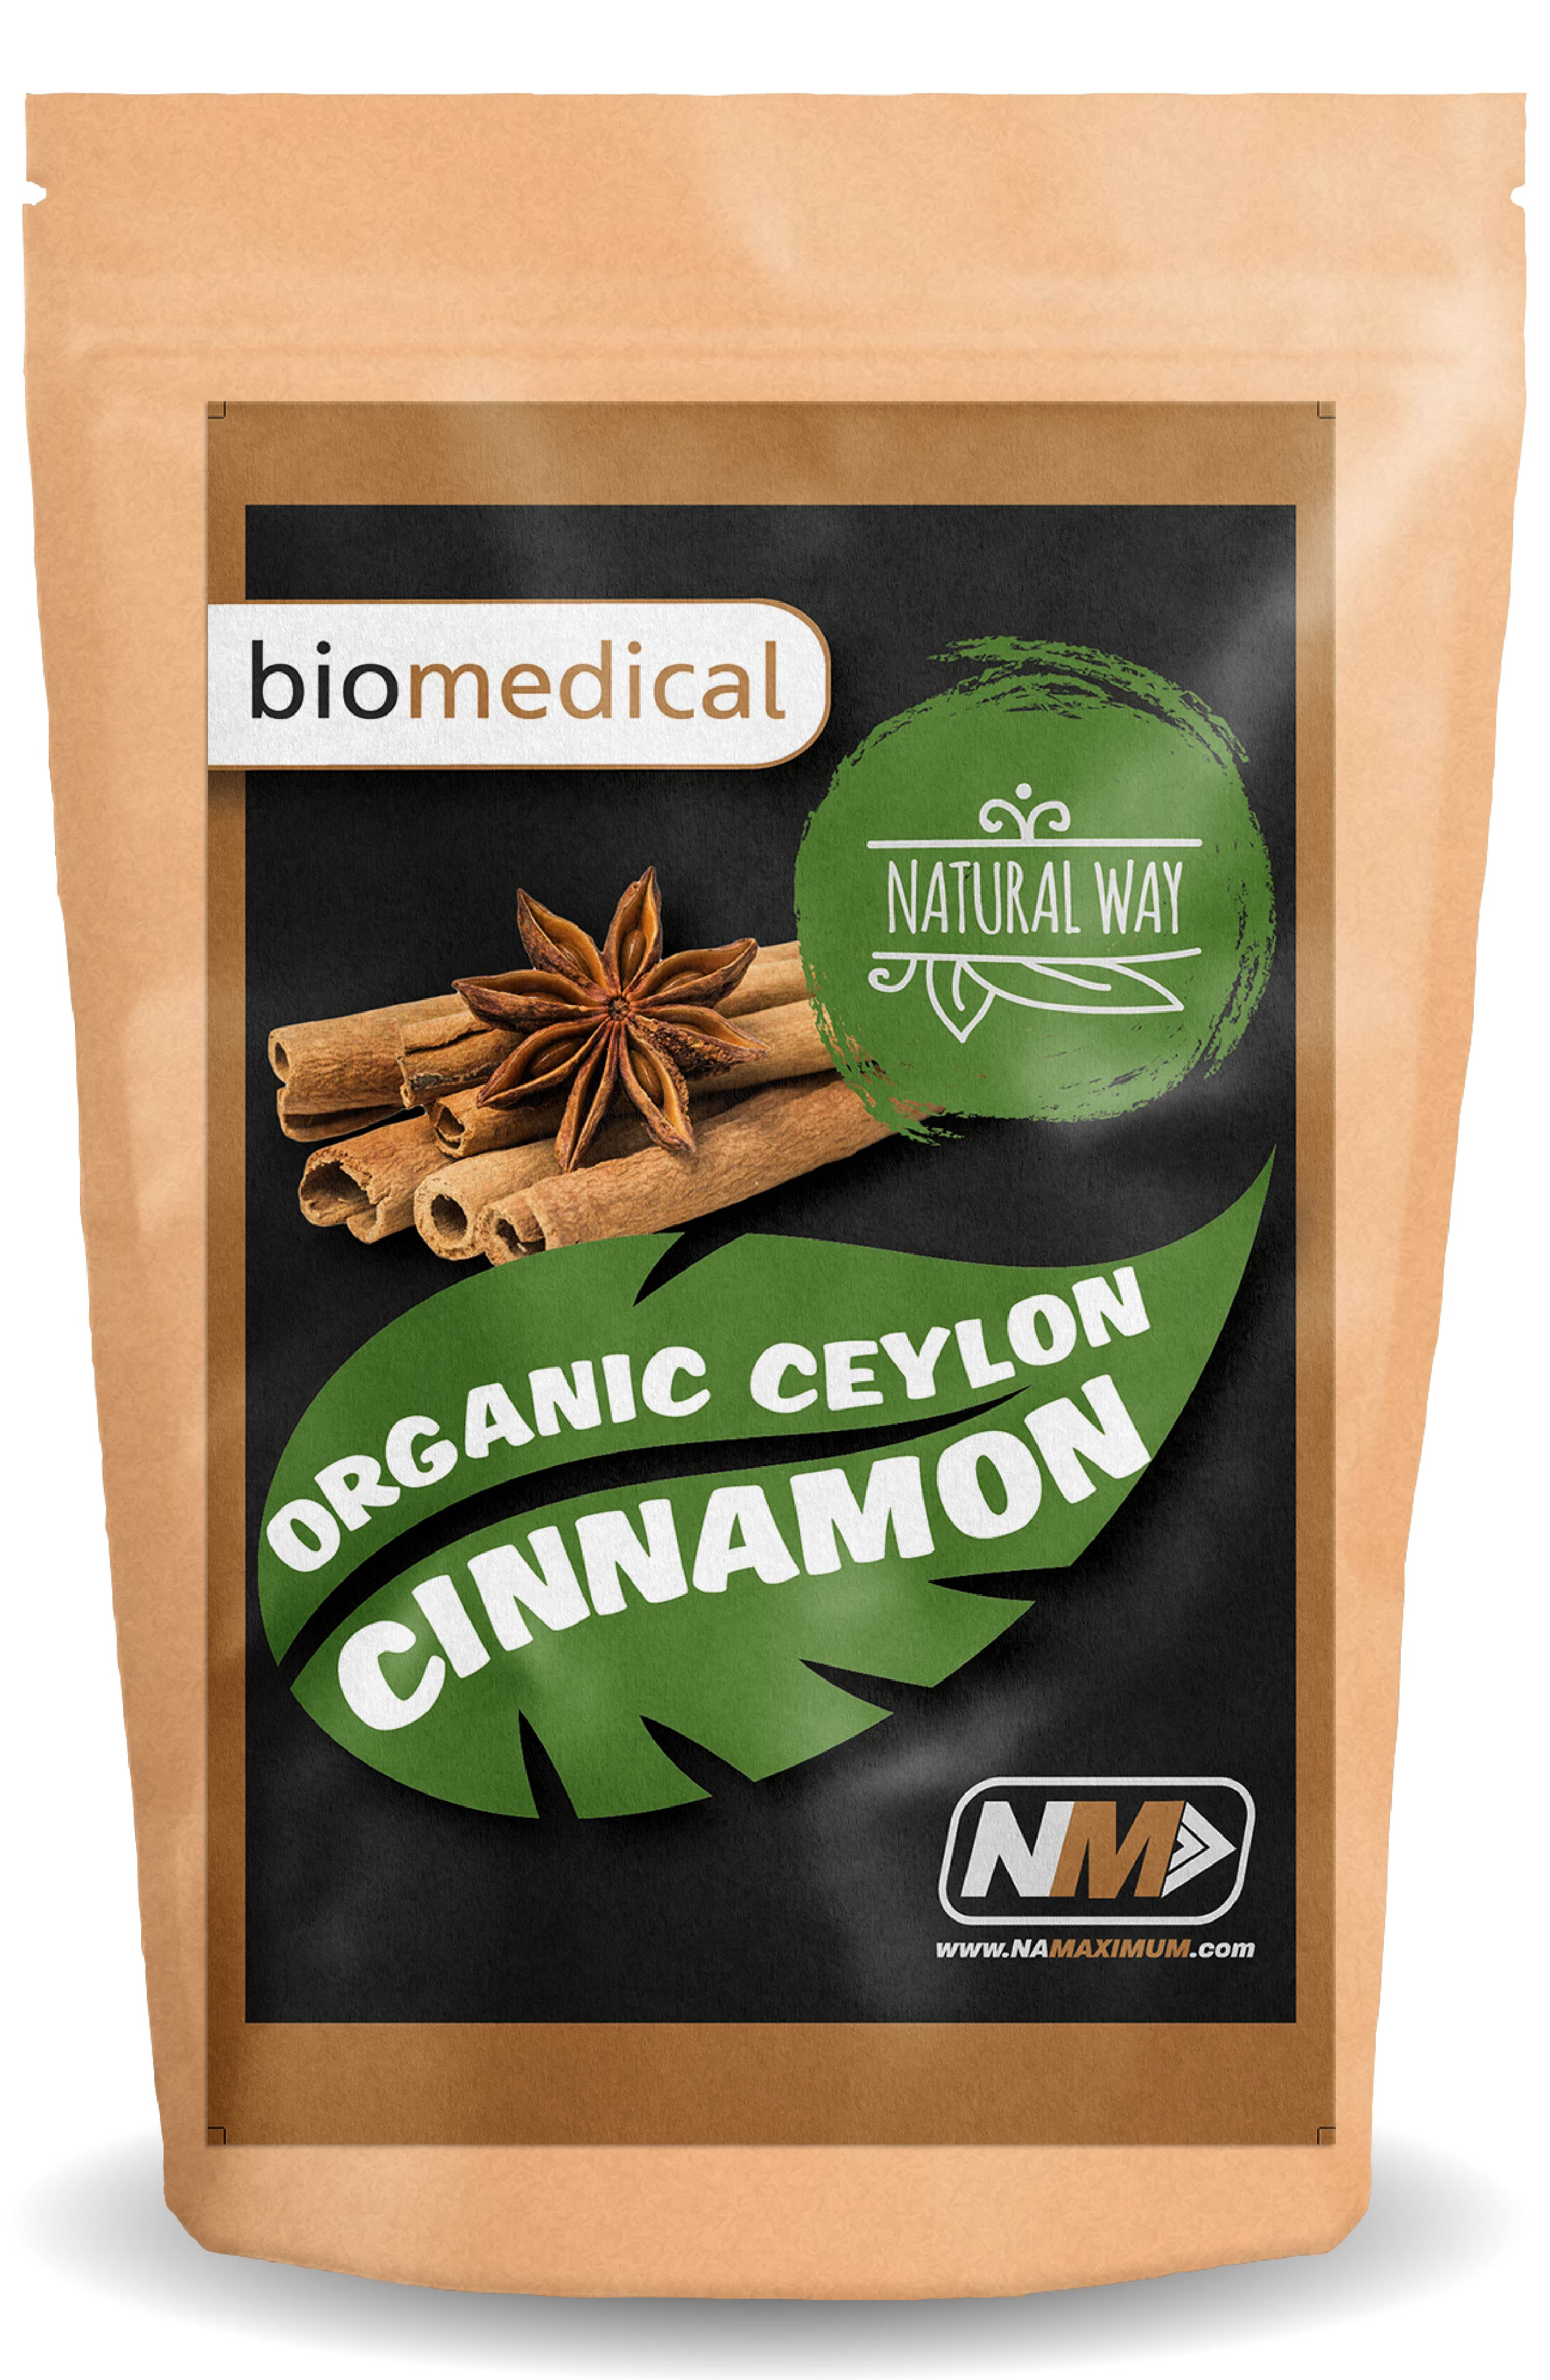 Cejlónska škorica Natural 200g